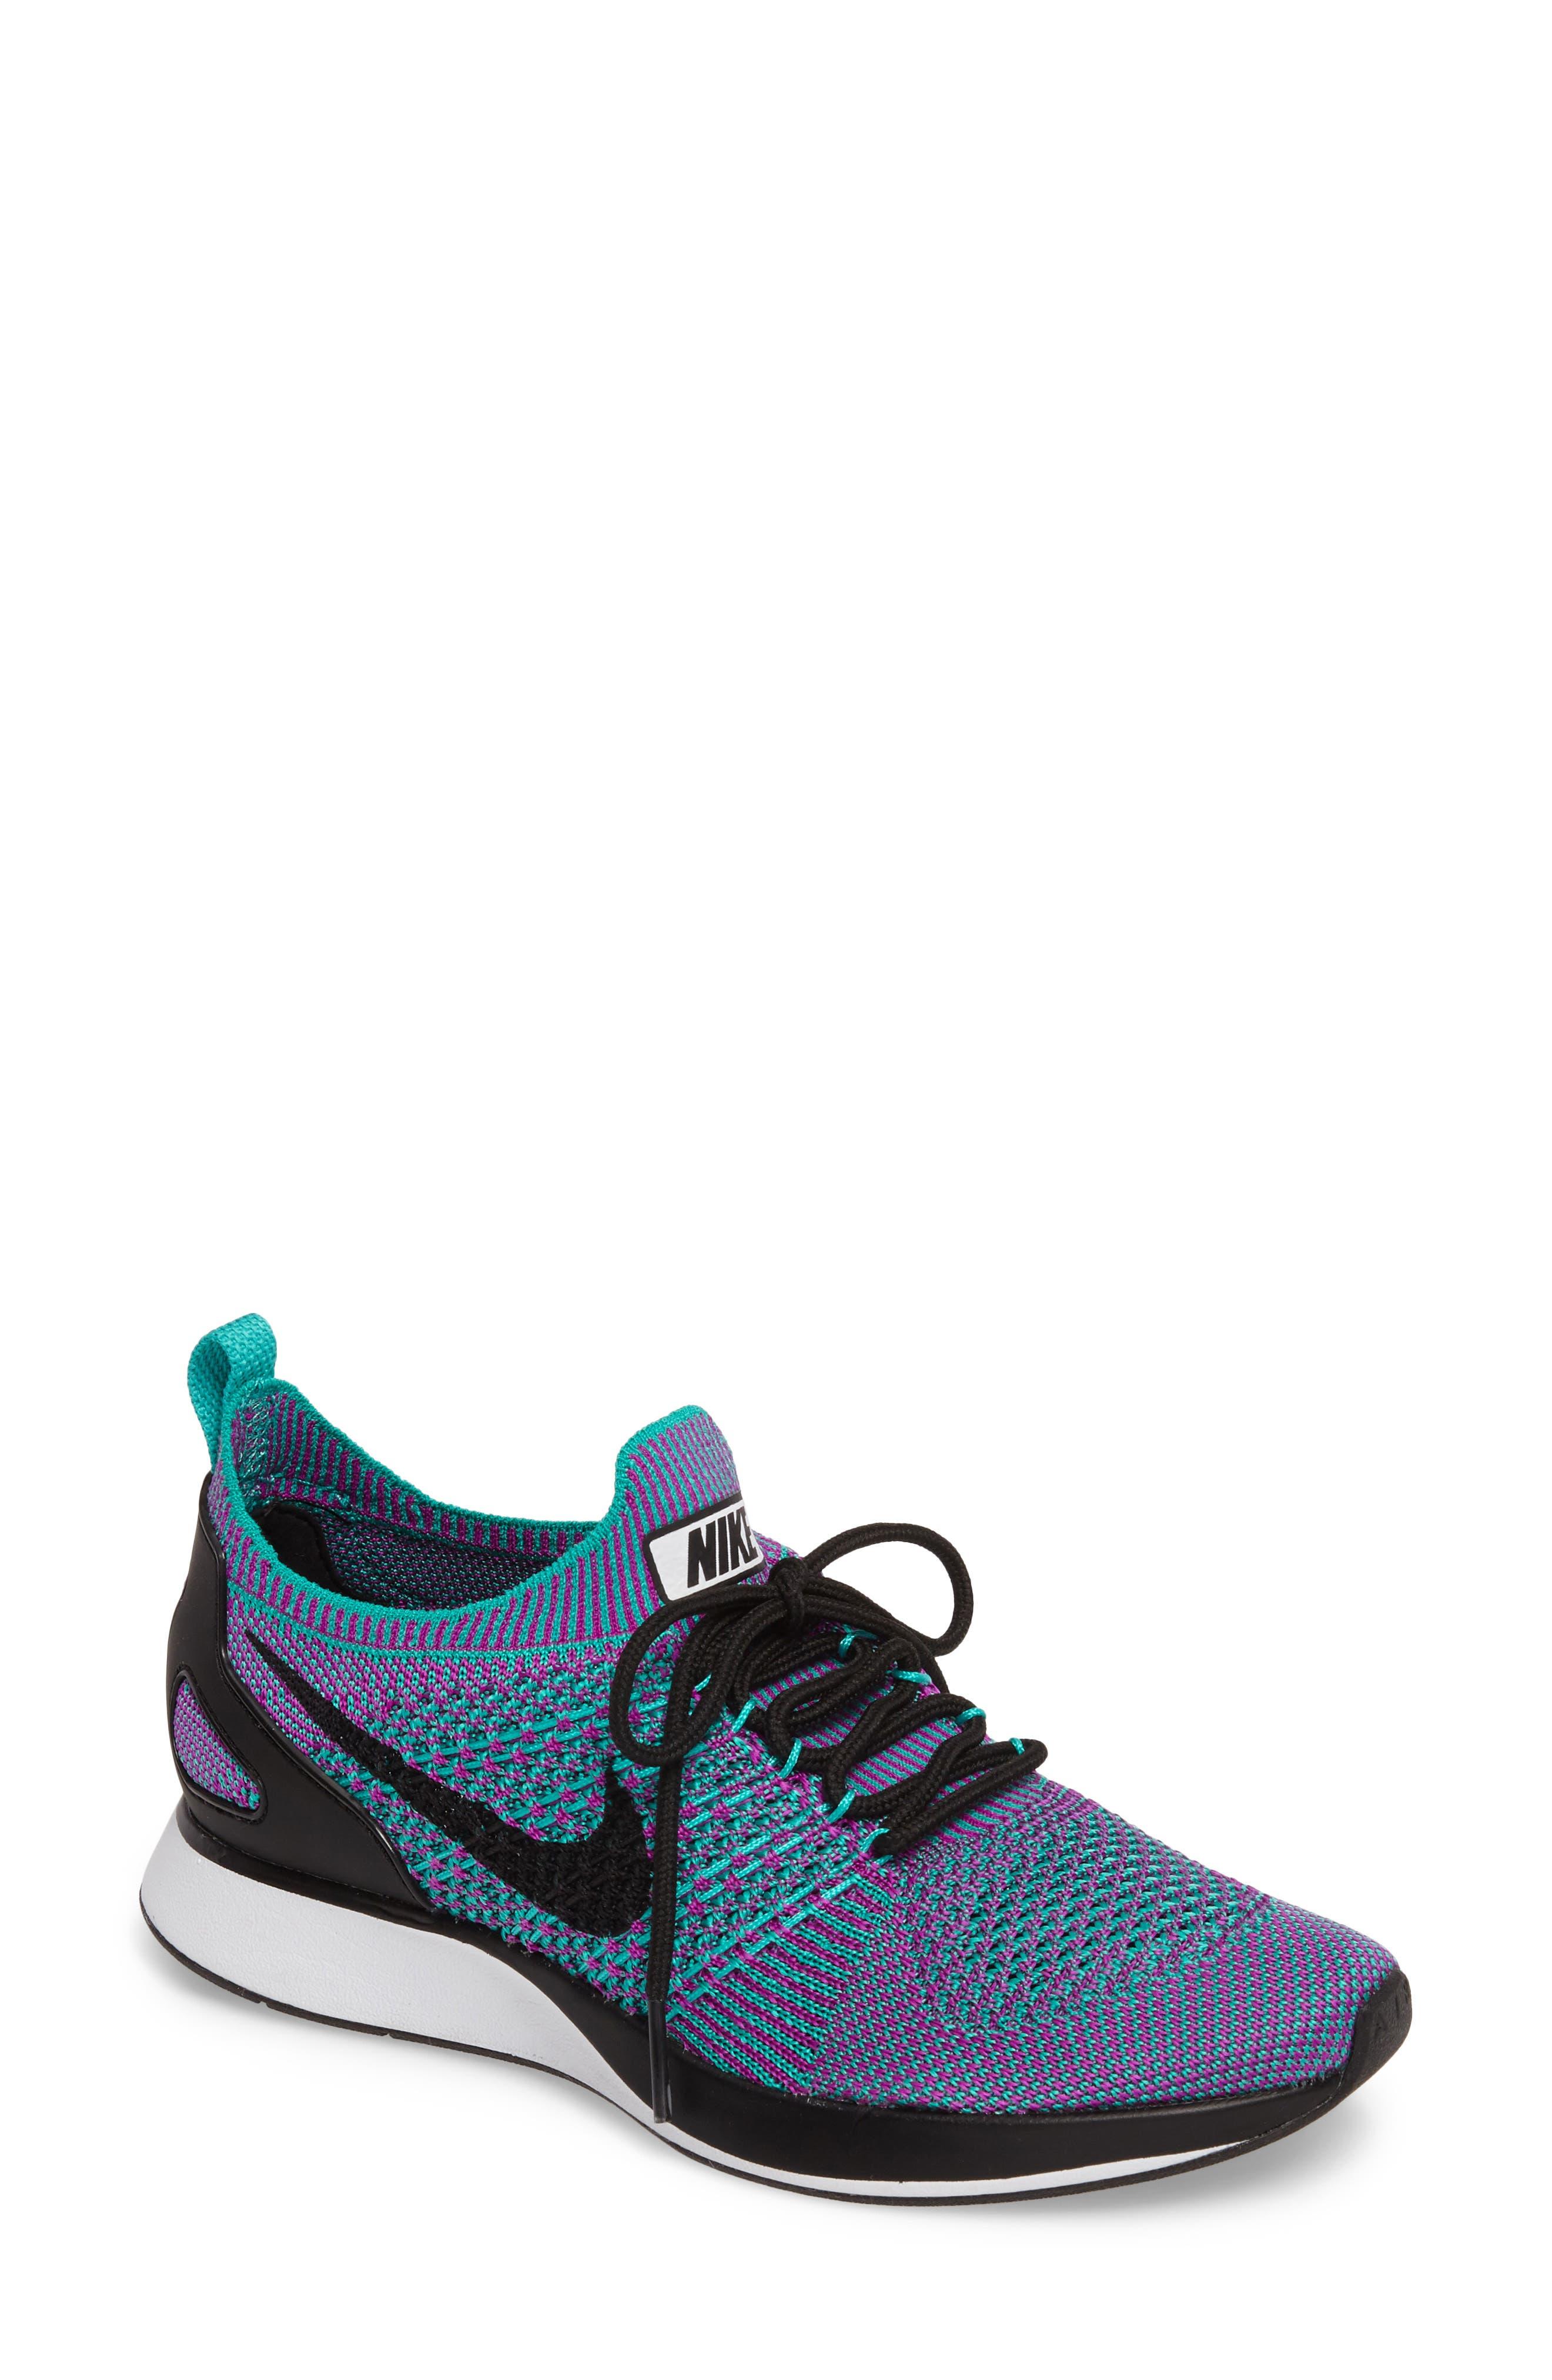 Nike Zoom Mariah Flyknit Racer Premium Sneaker (Women)